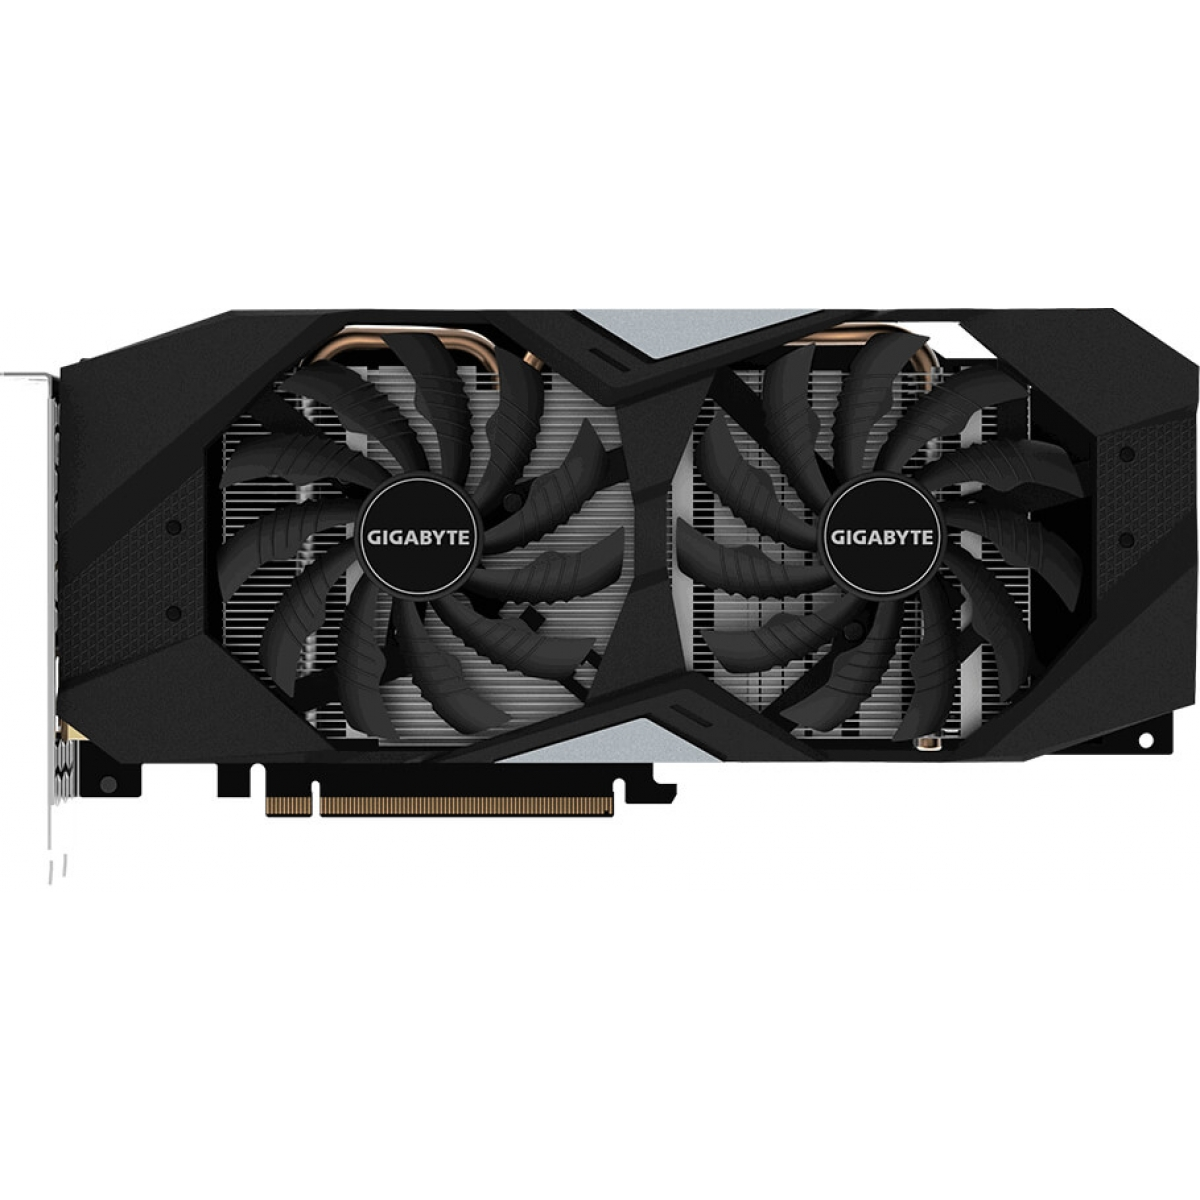 Placa de Vídeo Gigabyte Geforce RTX 2060 Windforce OC Dual, 6GB GDDR6, 192Bit